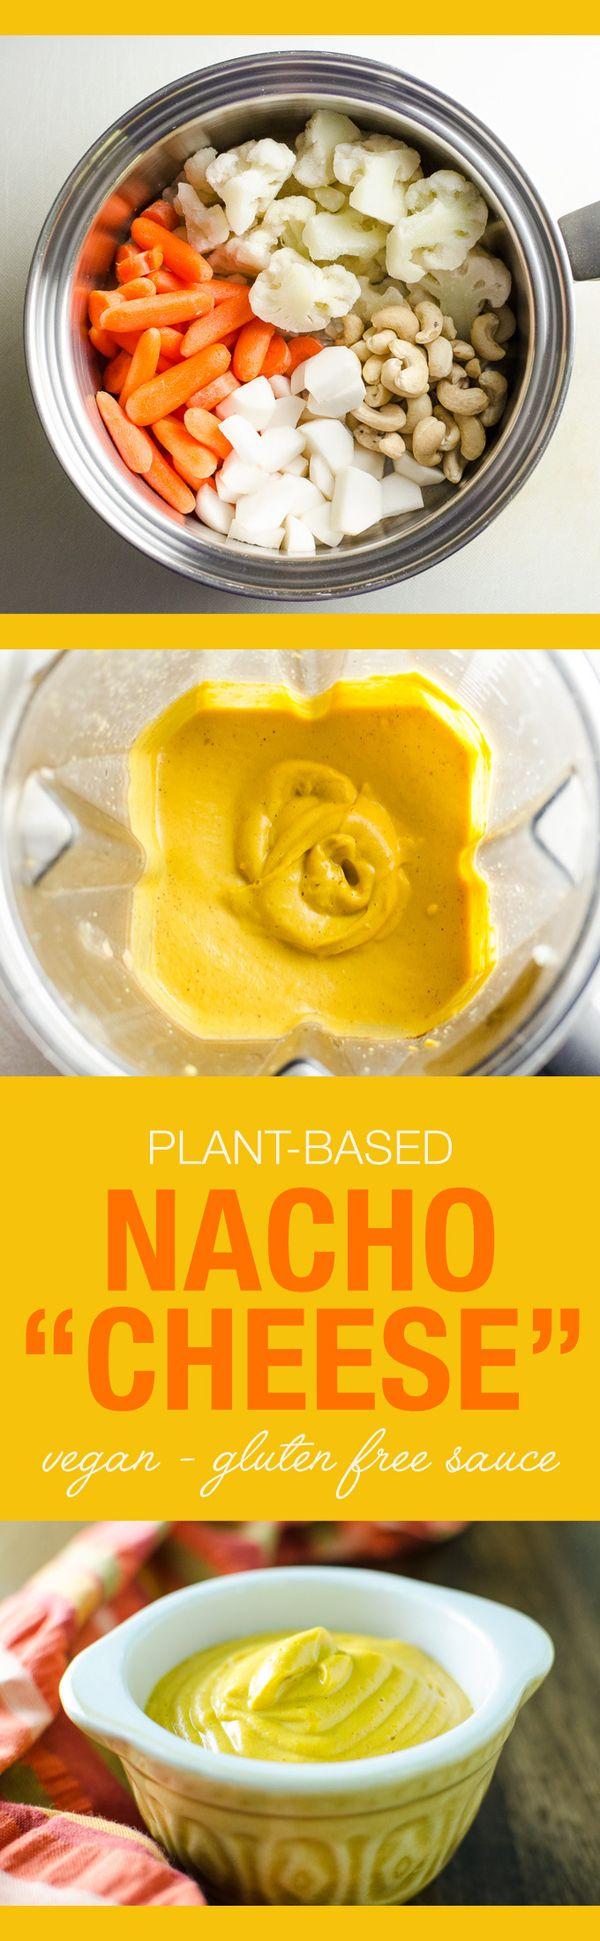 Plant-Based Nacho Cheese Sauce